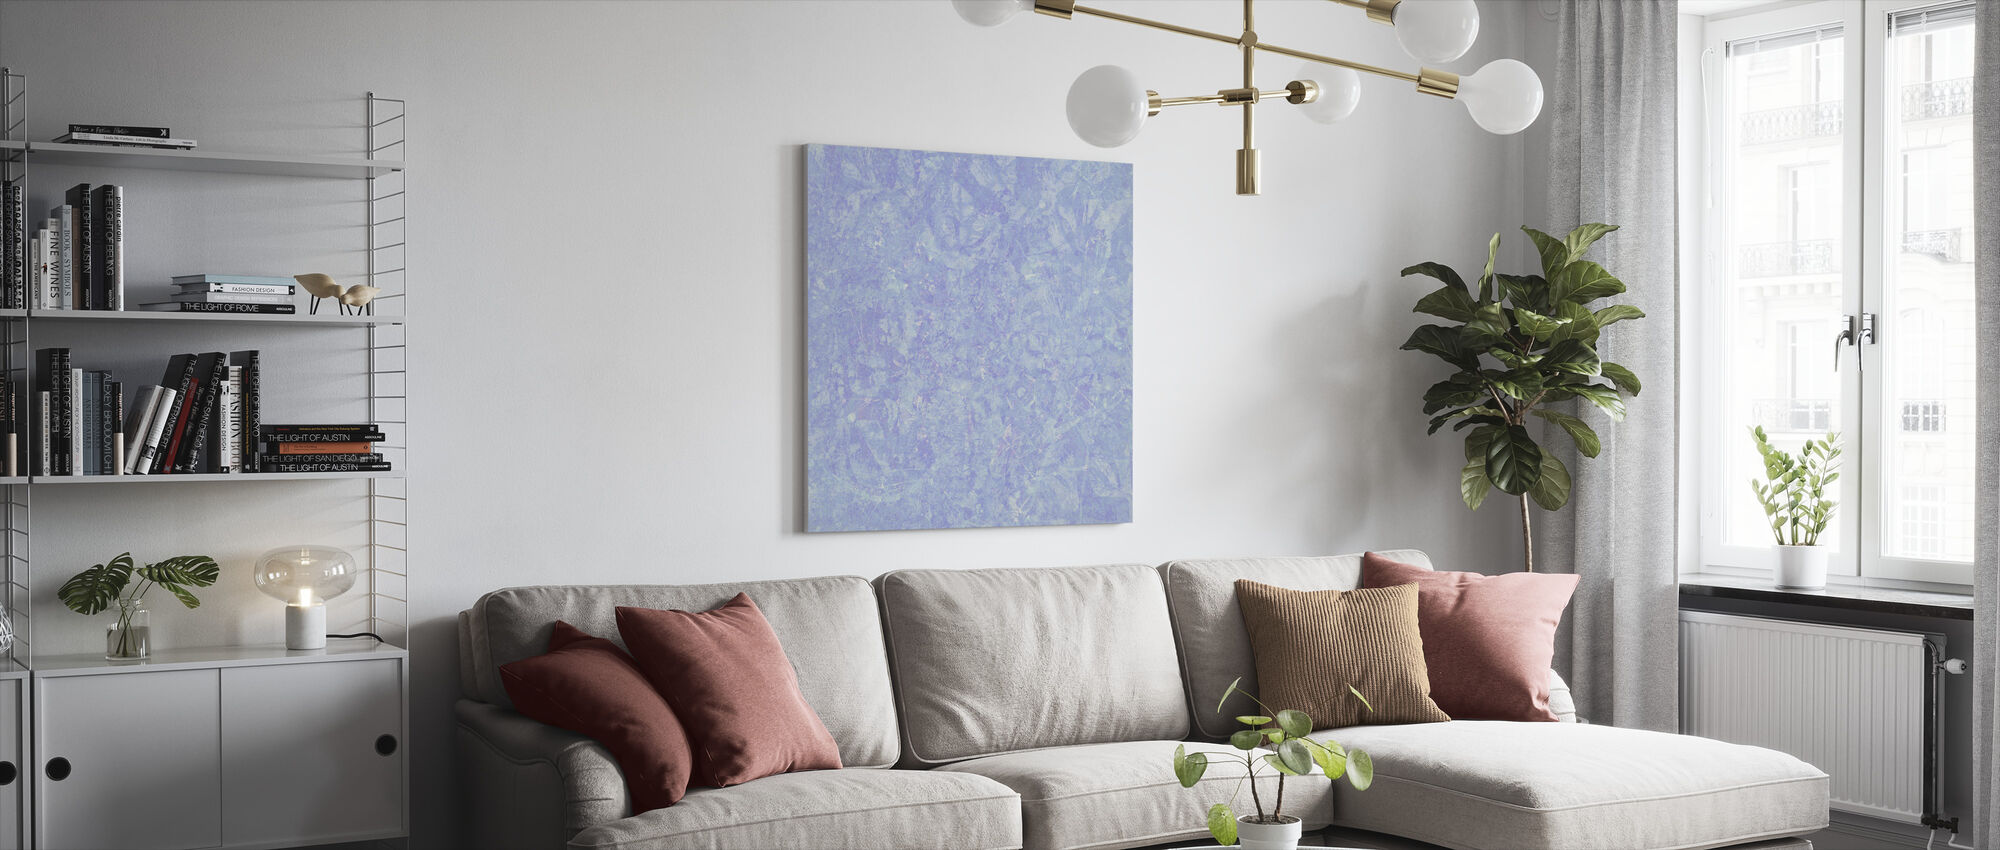 Sininen pesu - Canvastaulu - Olohuone